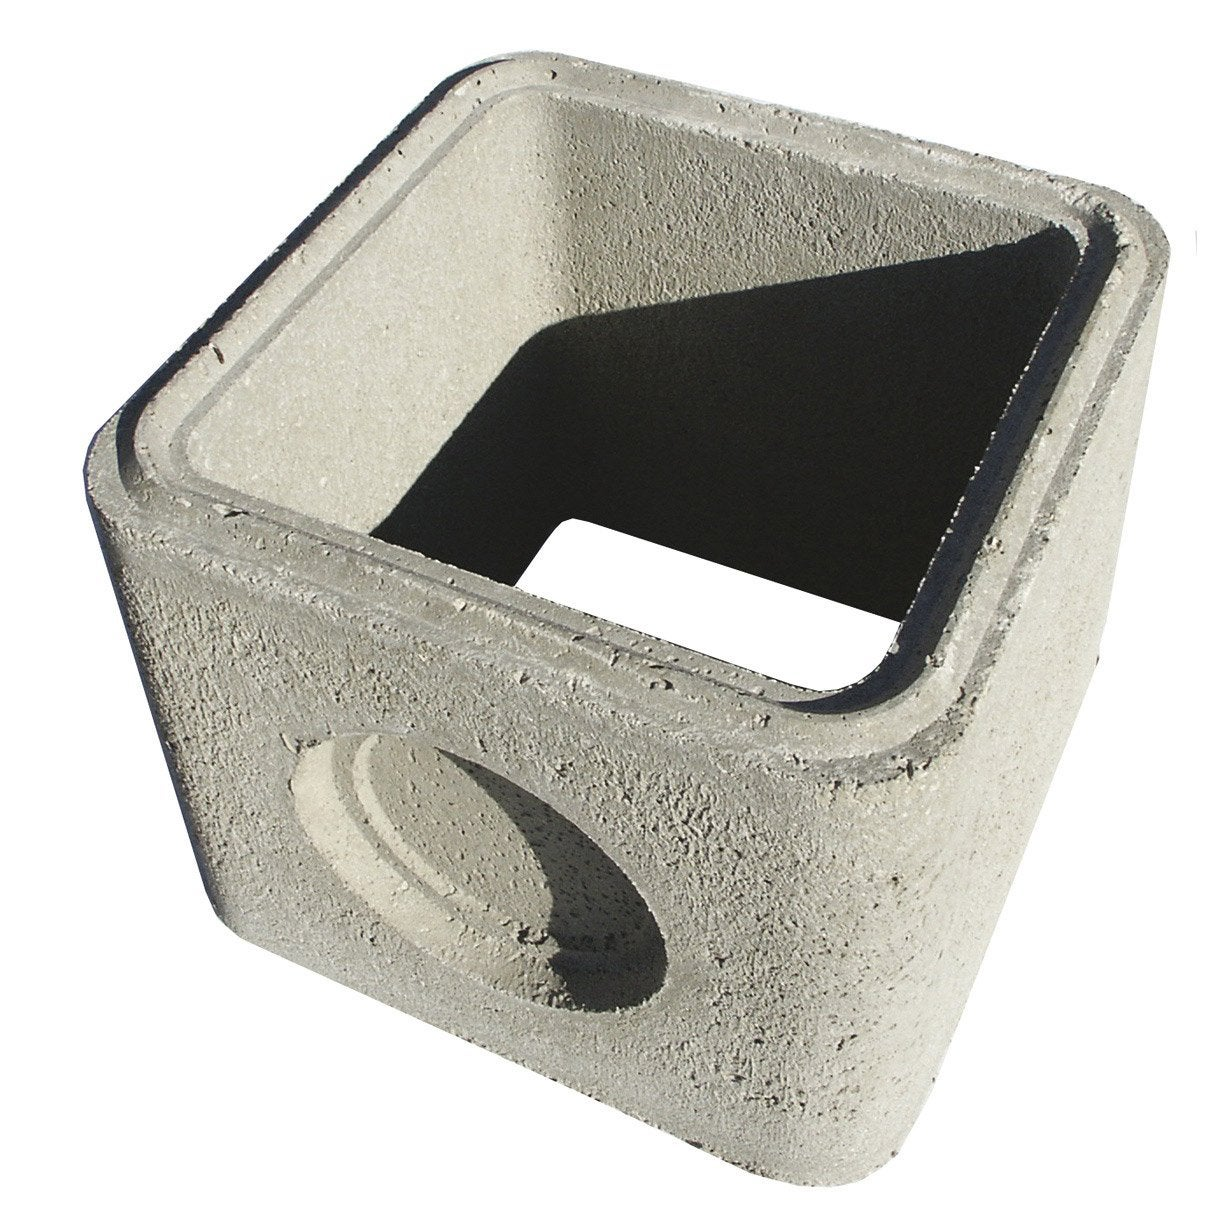 Rehausse bt40 b ton 40x40x33 cm leroy merlin - Rehausse beton ronde ...